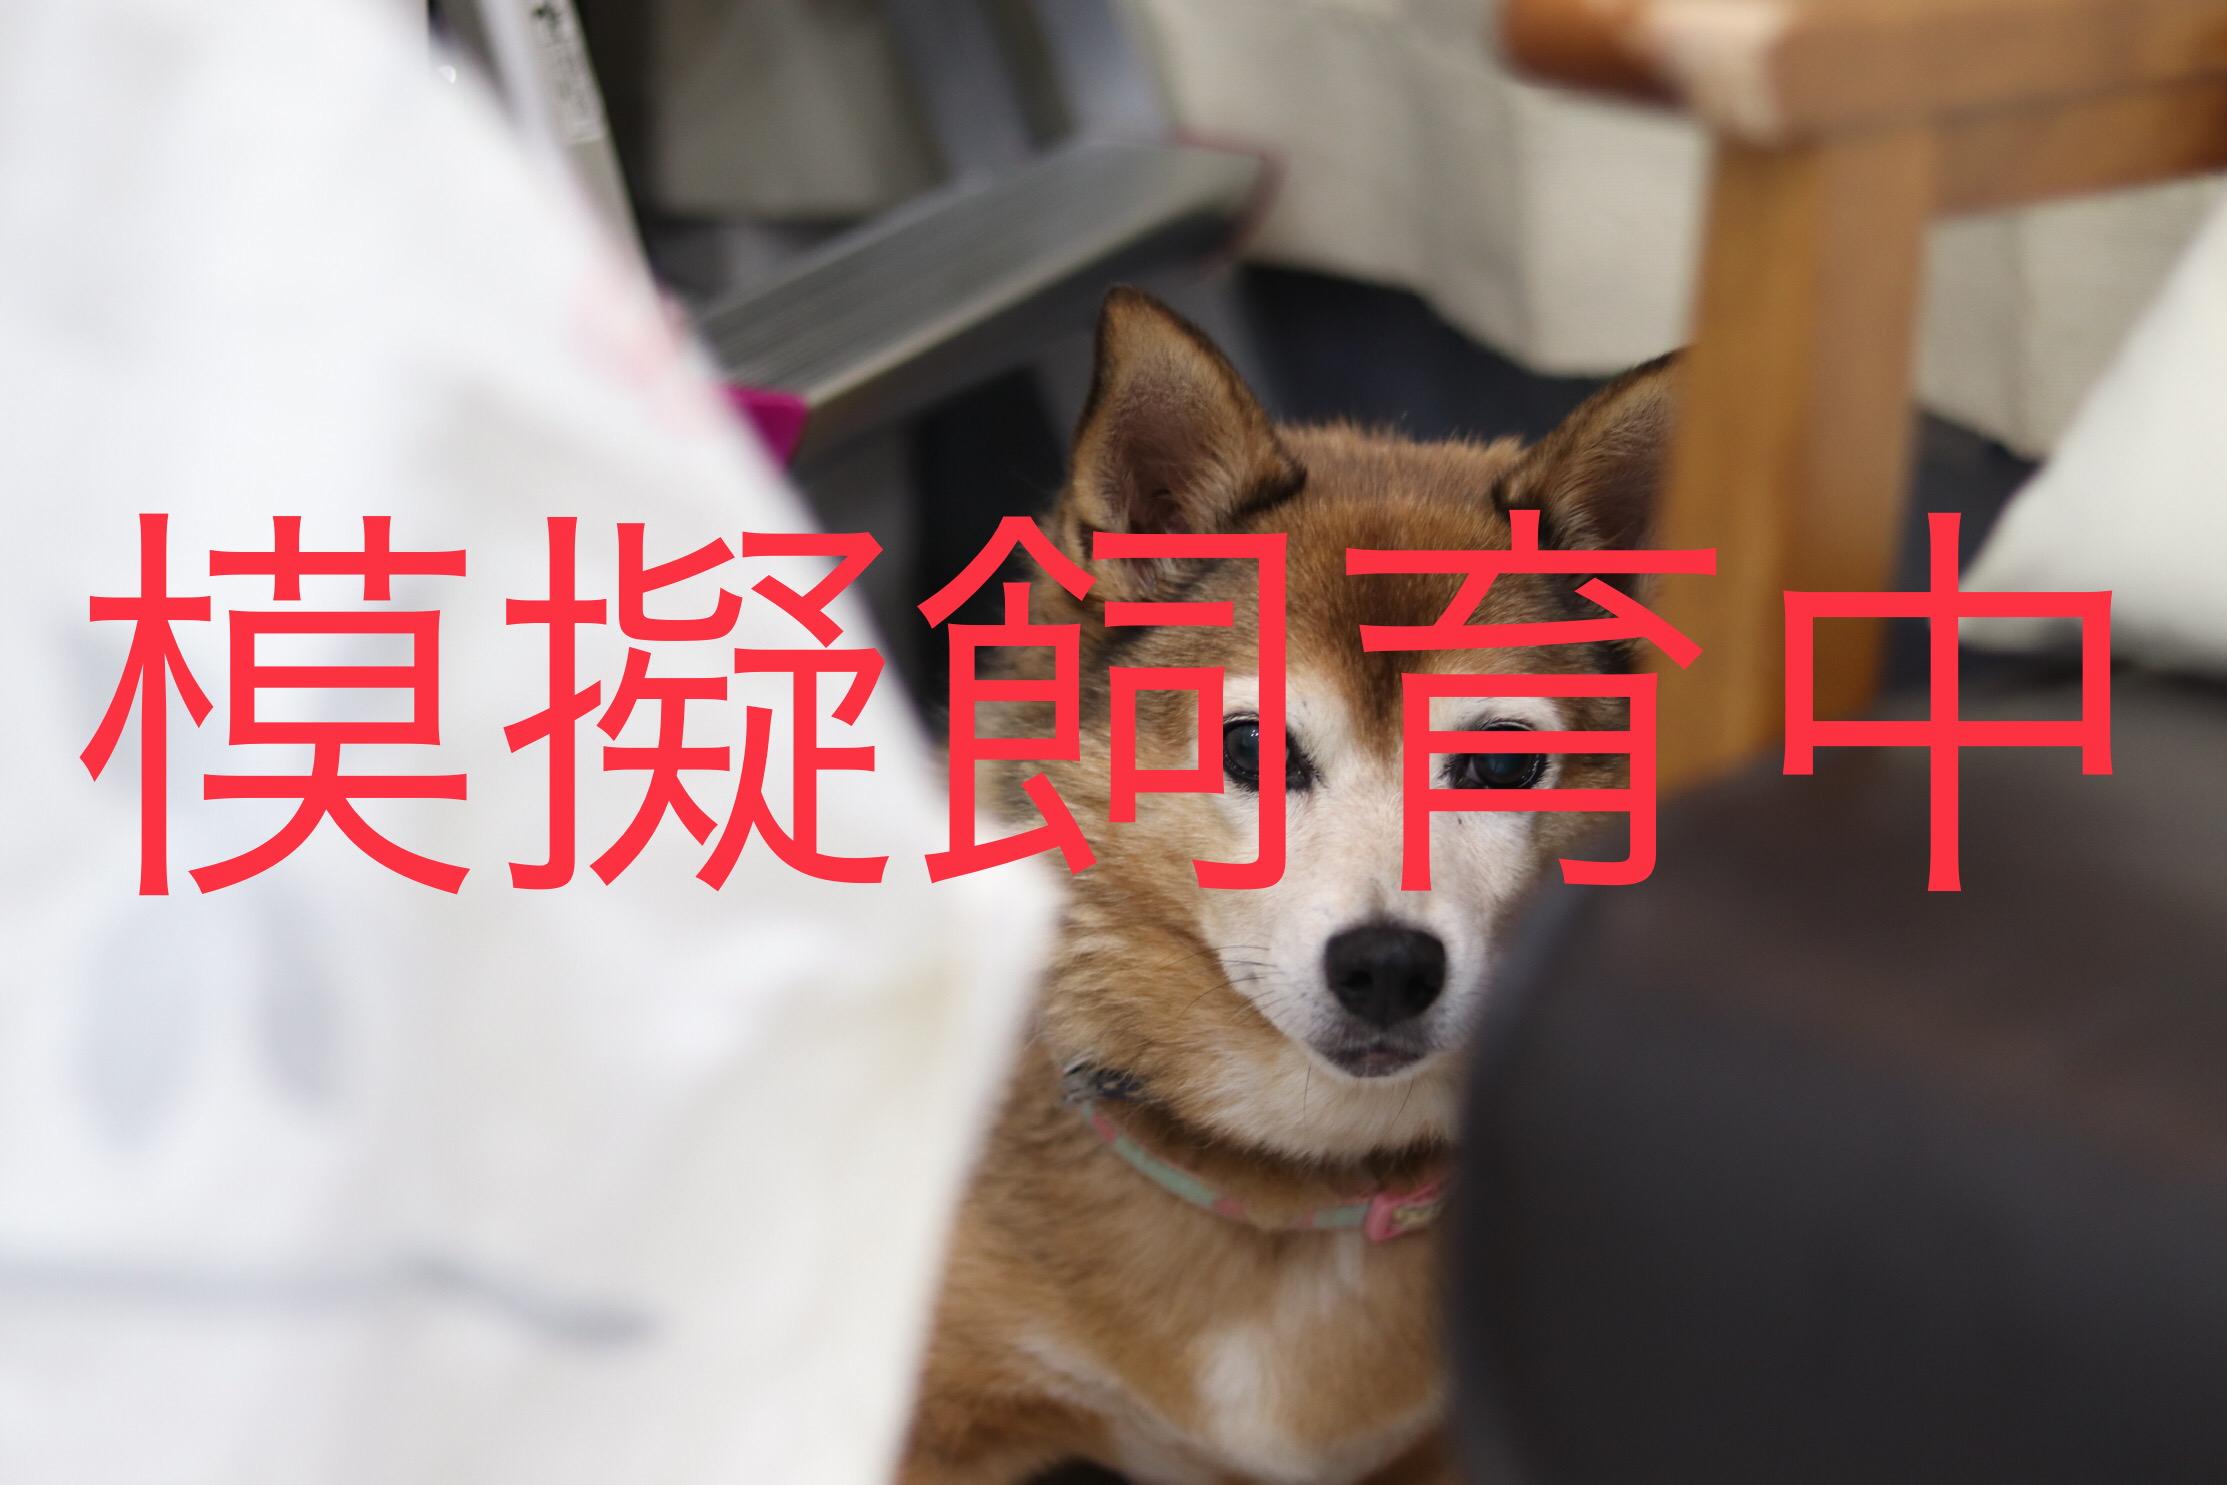 <ul> <li>犬種:雑種</li> <li>性別:女の子</li> <li>名前:チコ</li> <li>年齢:2008年11月生まれ</li> <li>保護経緯:飼い主が高齢になり病気療養のため飼育困難</li> </ul>